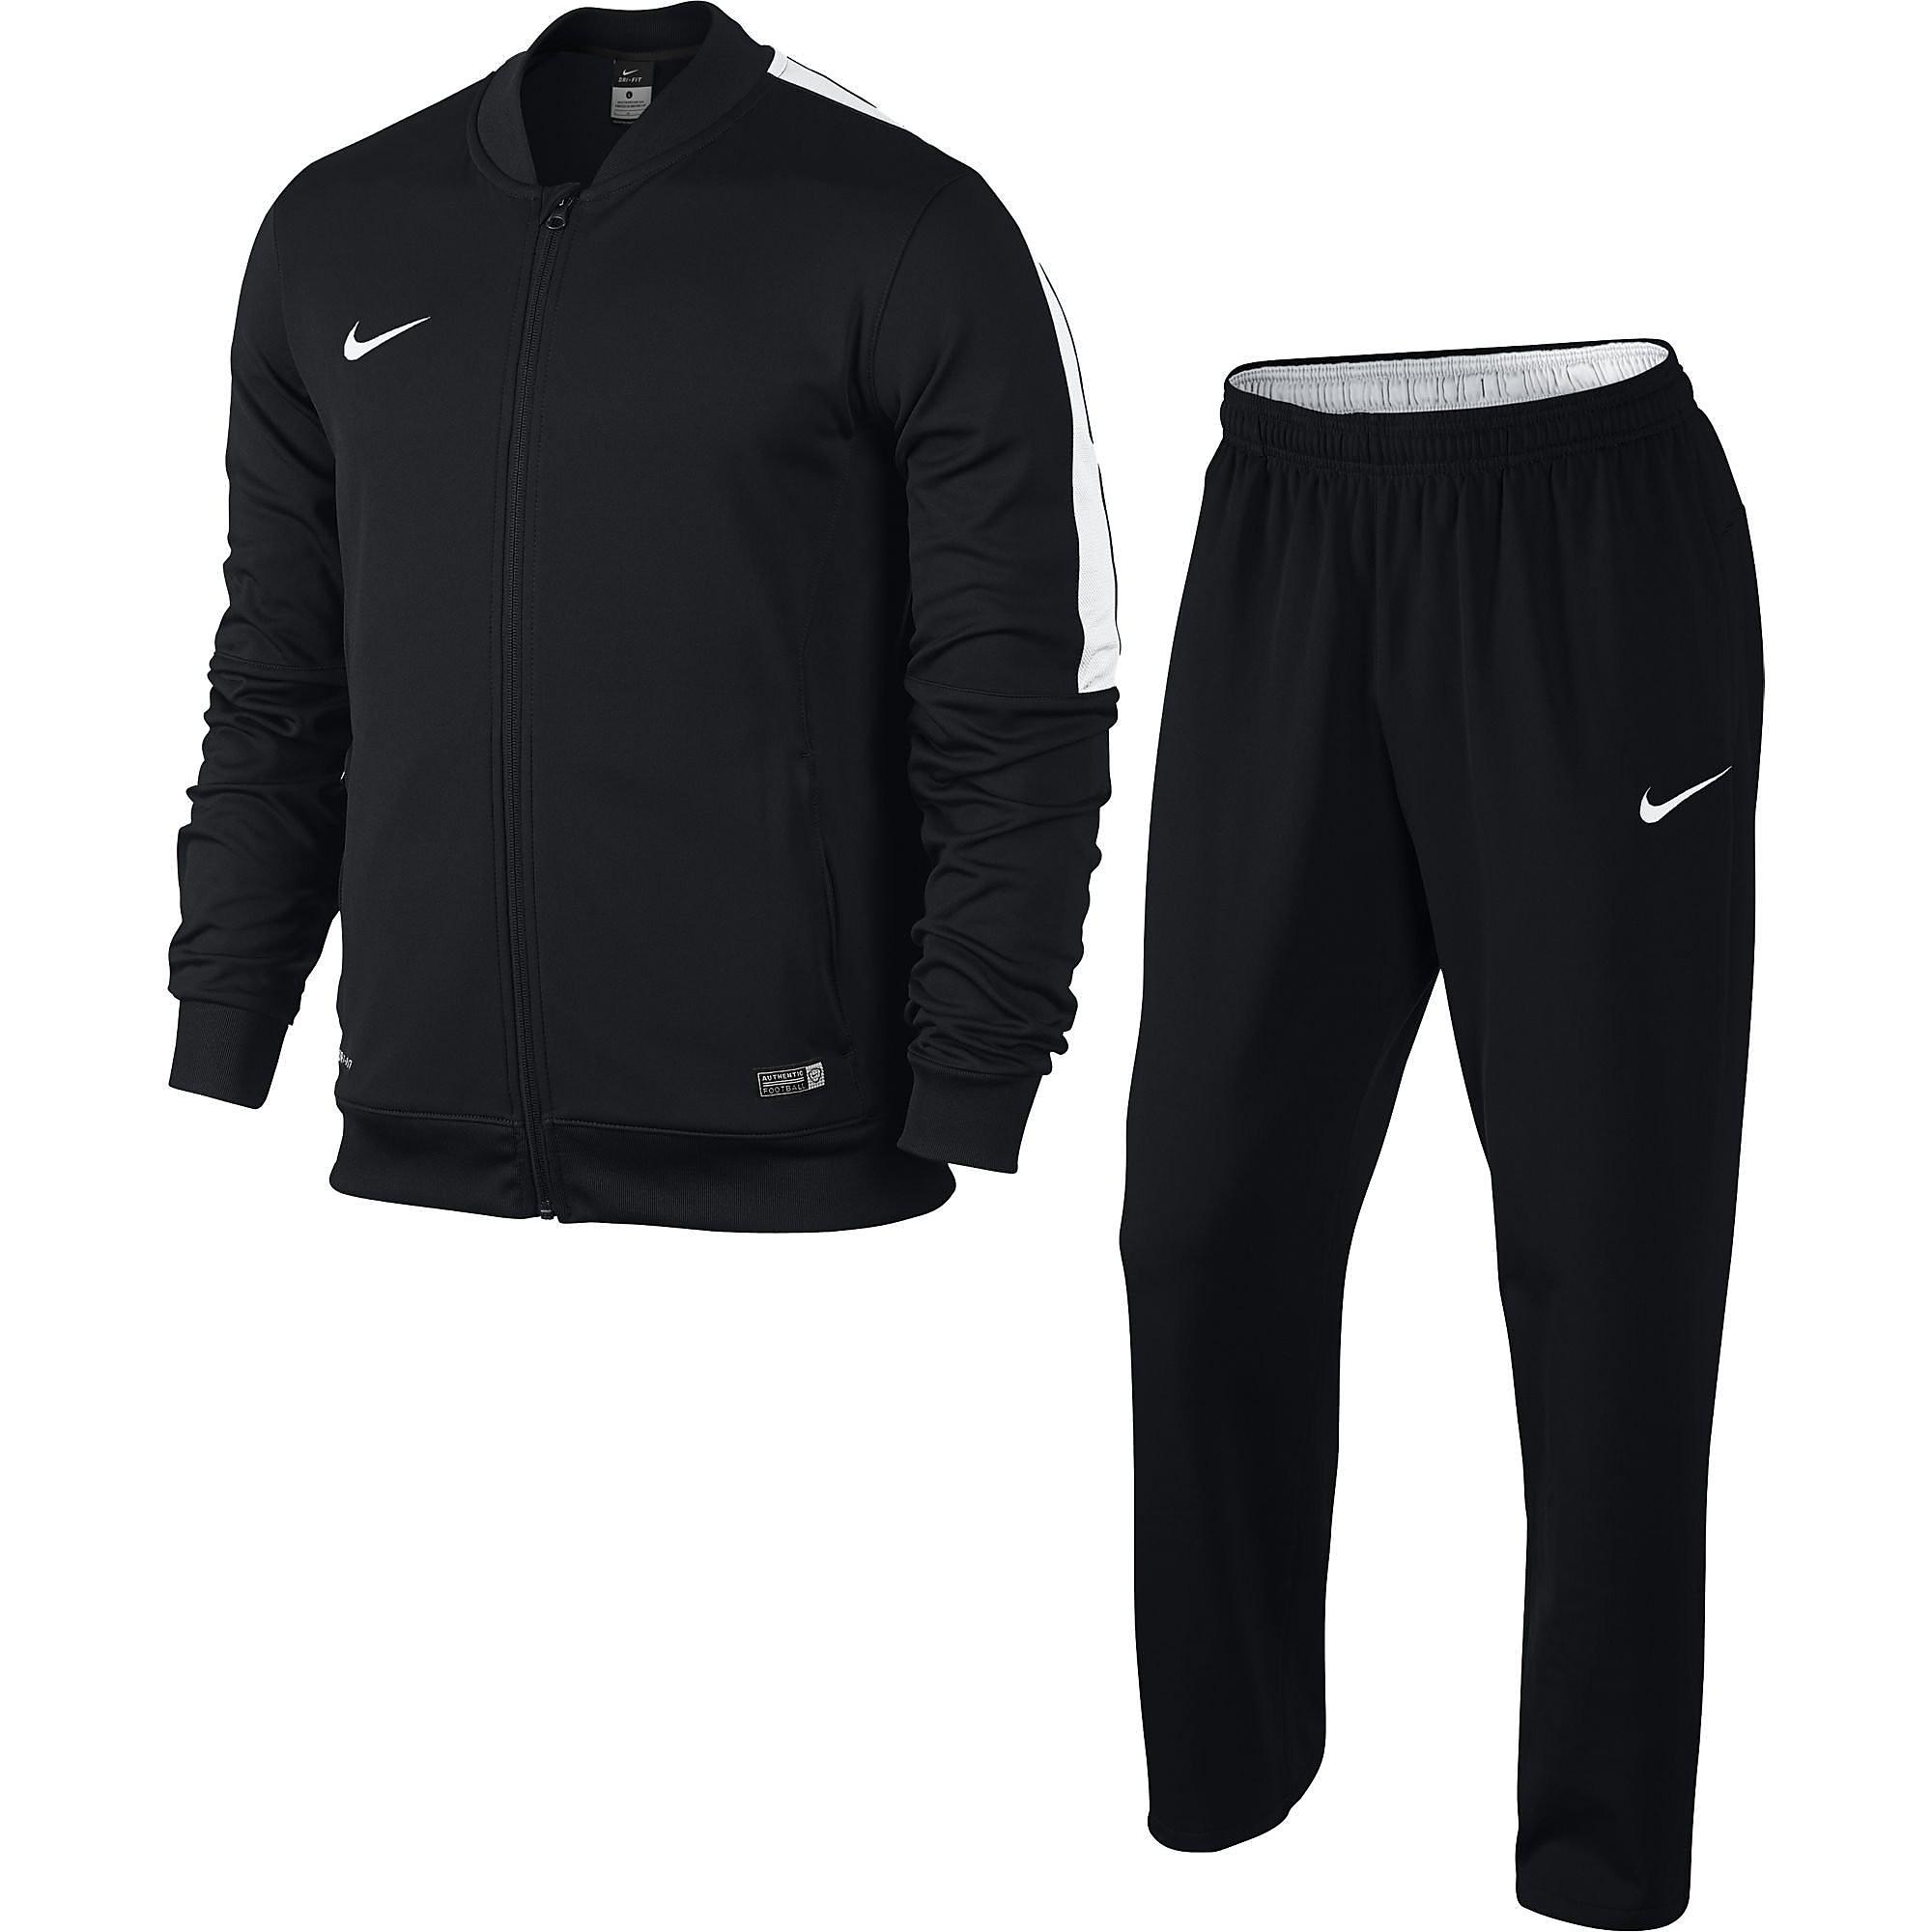 Nike ACADEMY SDLN KNIT WARM UP